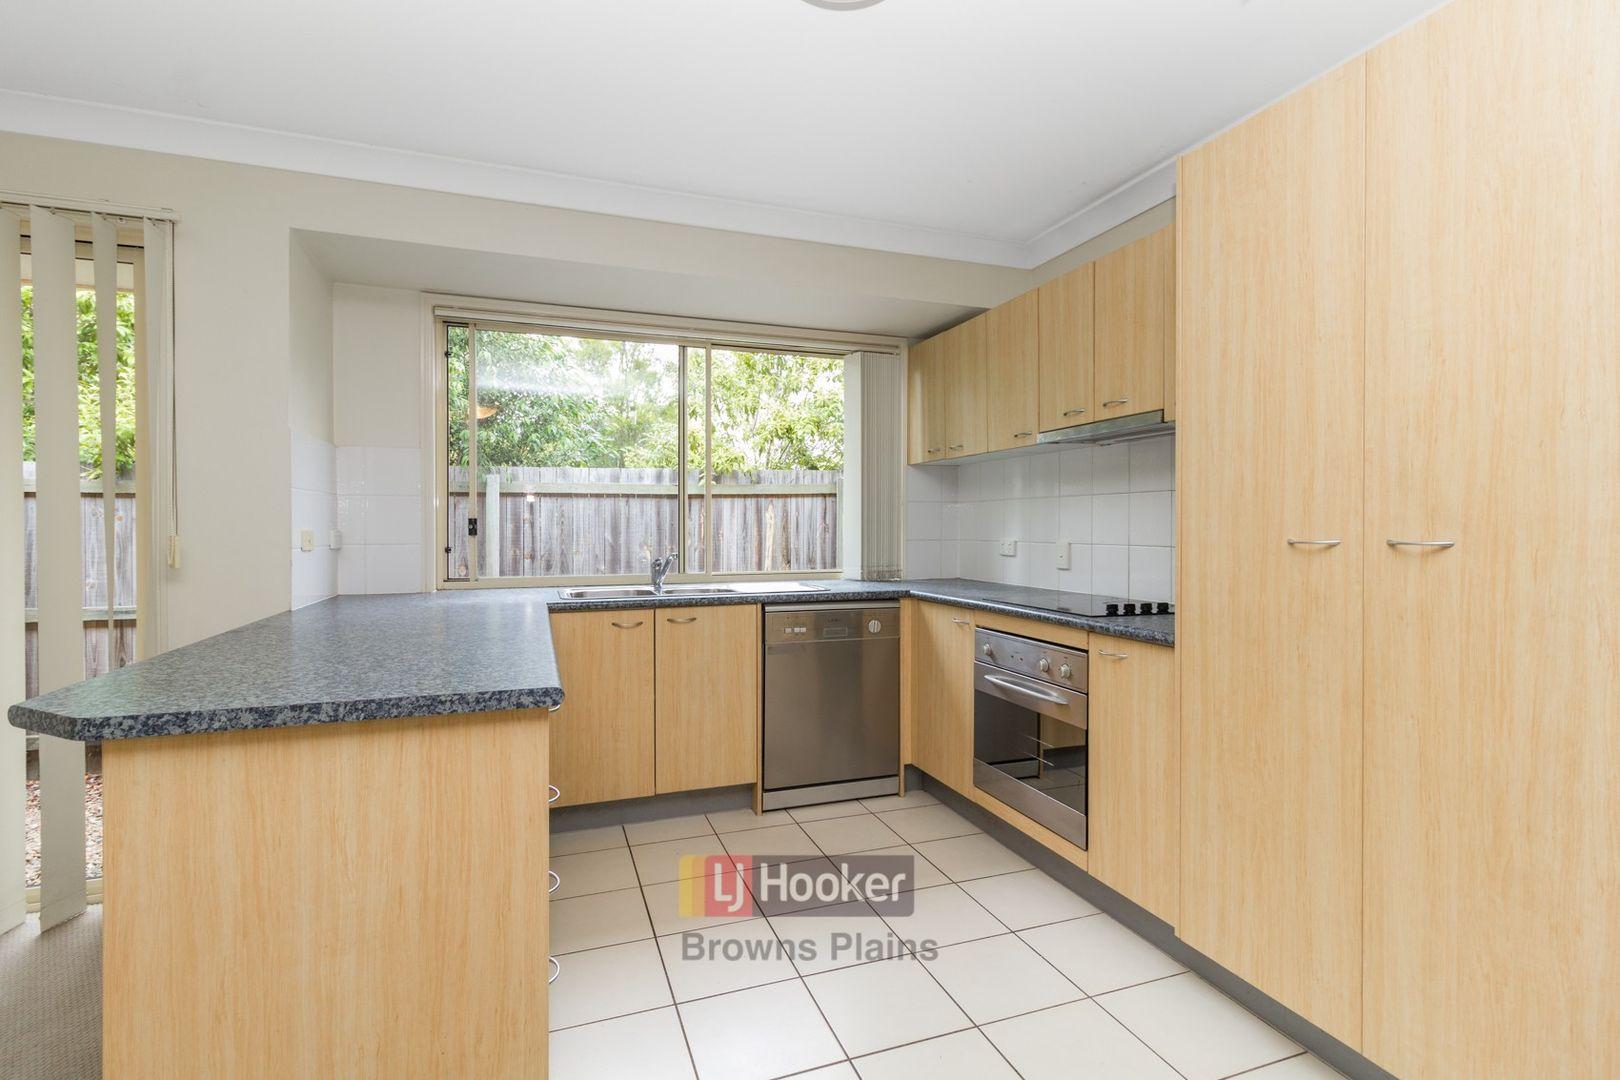 29/54-64 Short Street, Boronia Heights QLD 4124, Image 1